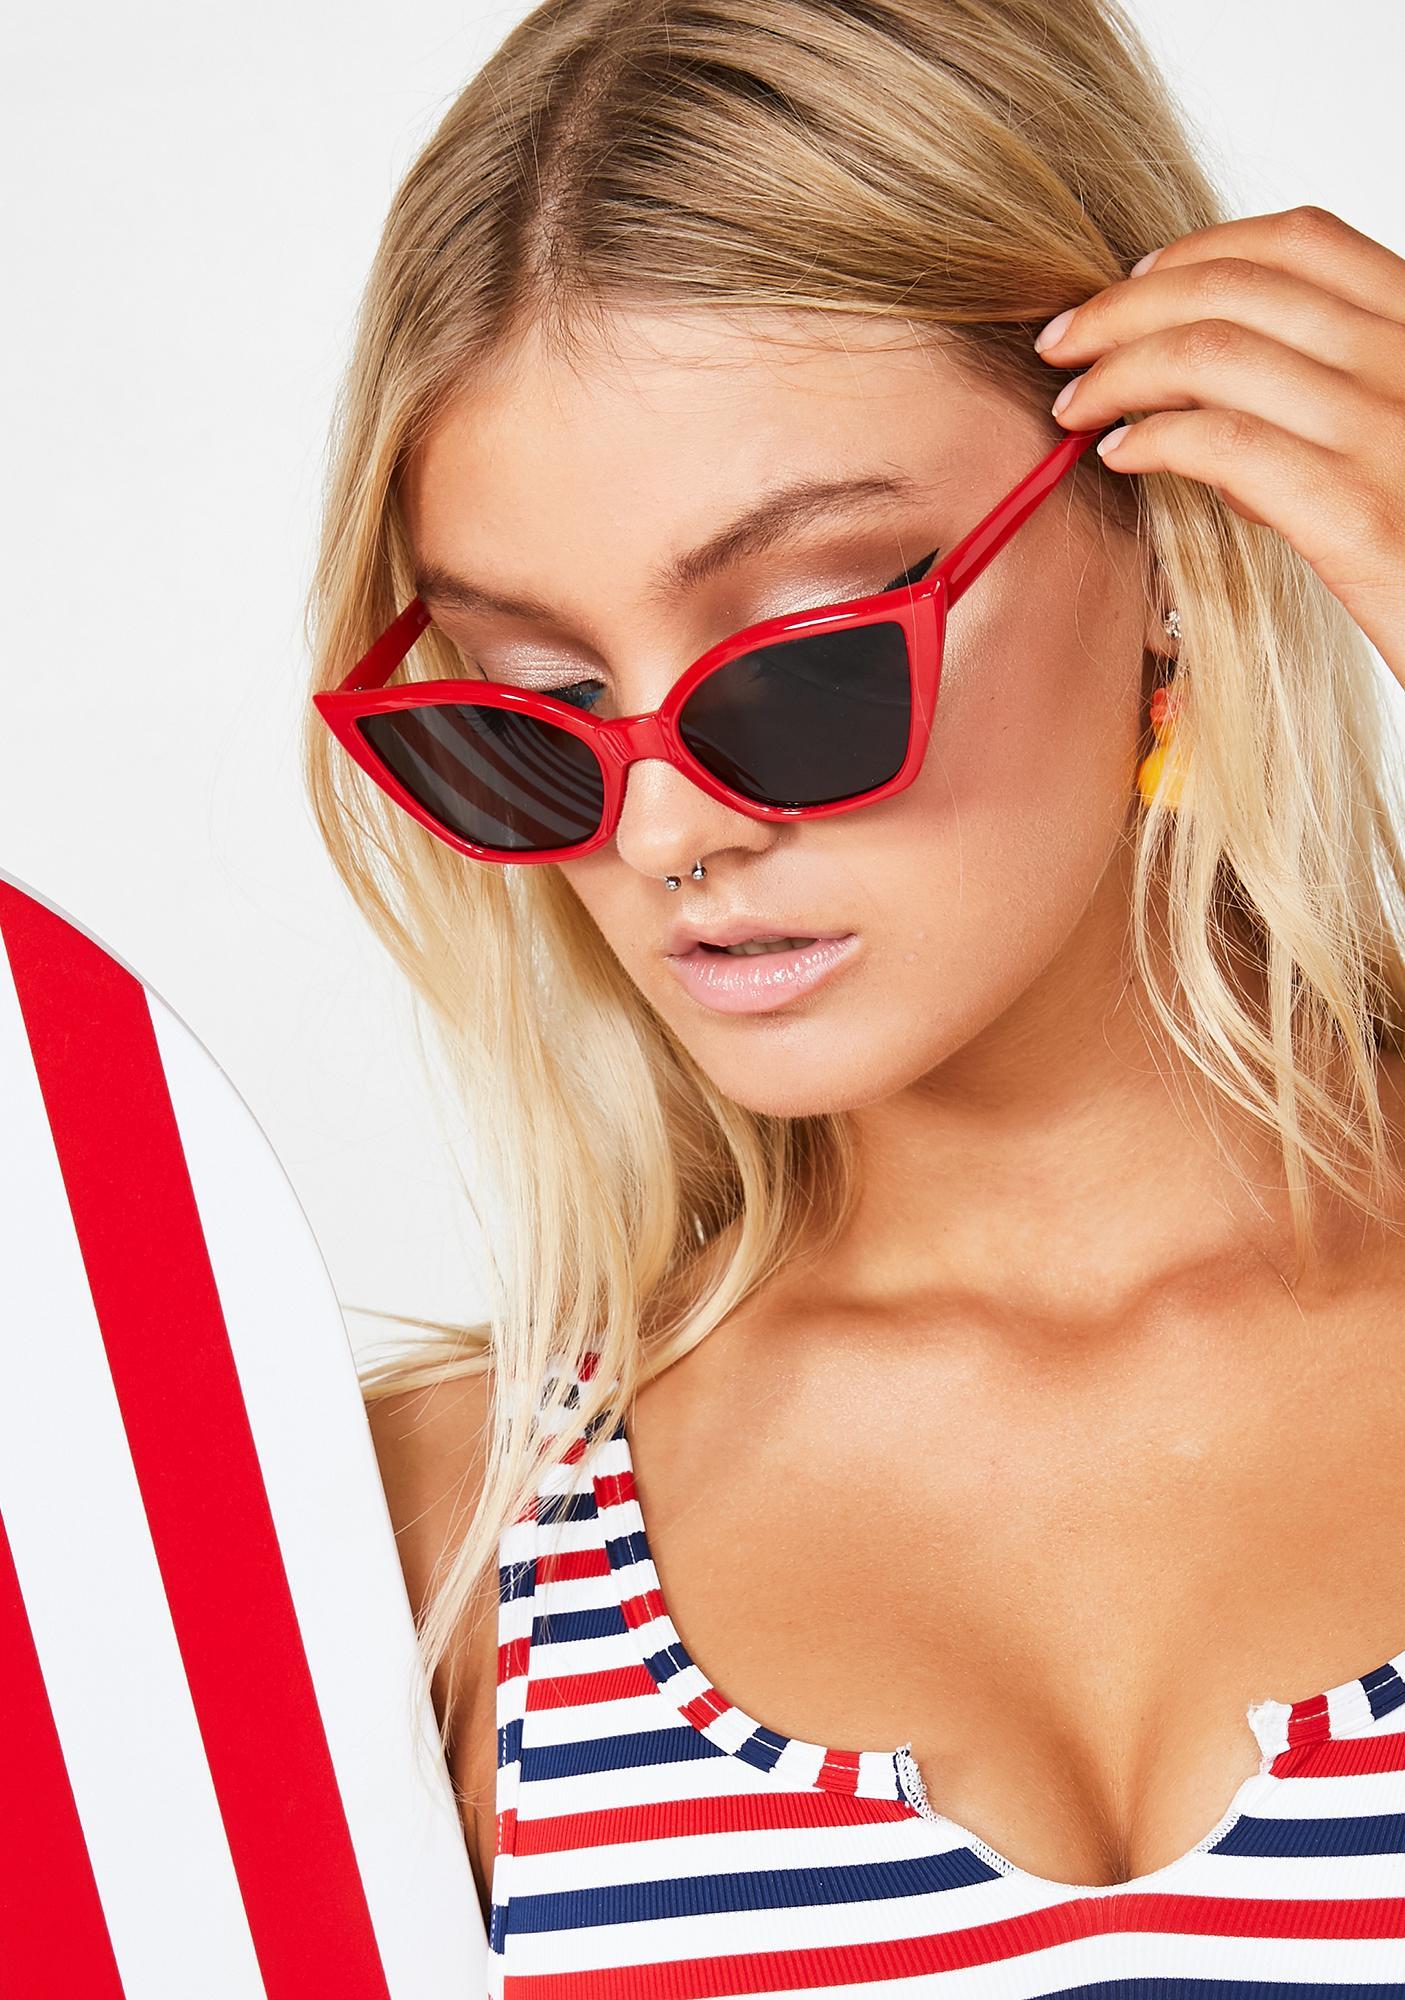 Replay Vintage Sunglasses Red Hot Cat-Eye Sunglasses